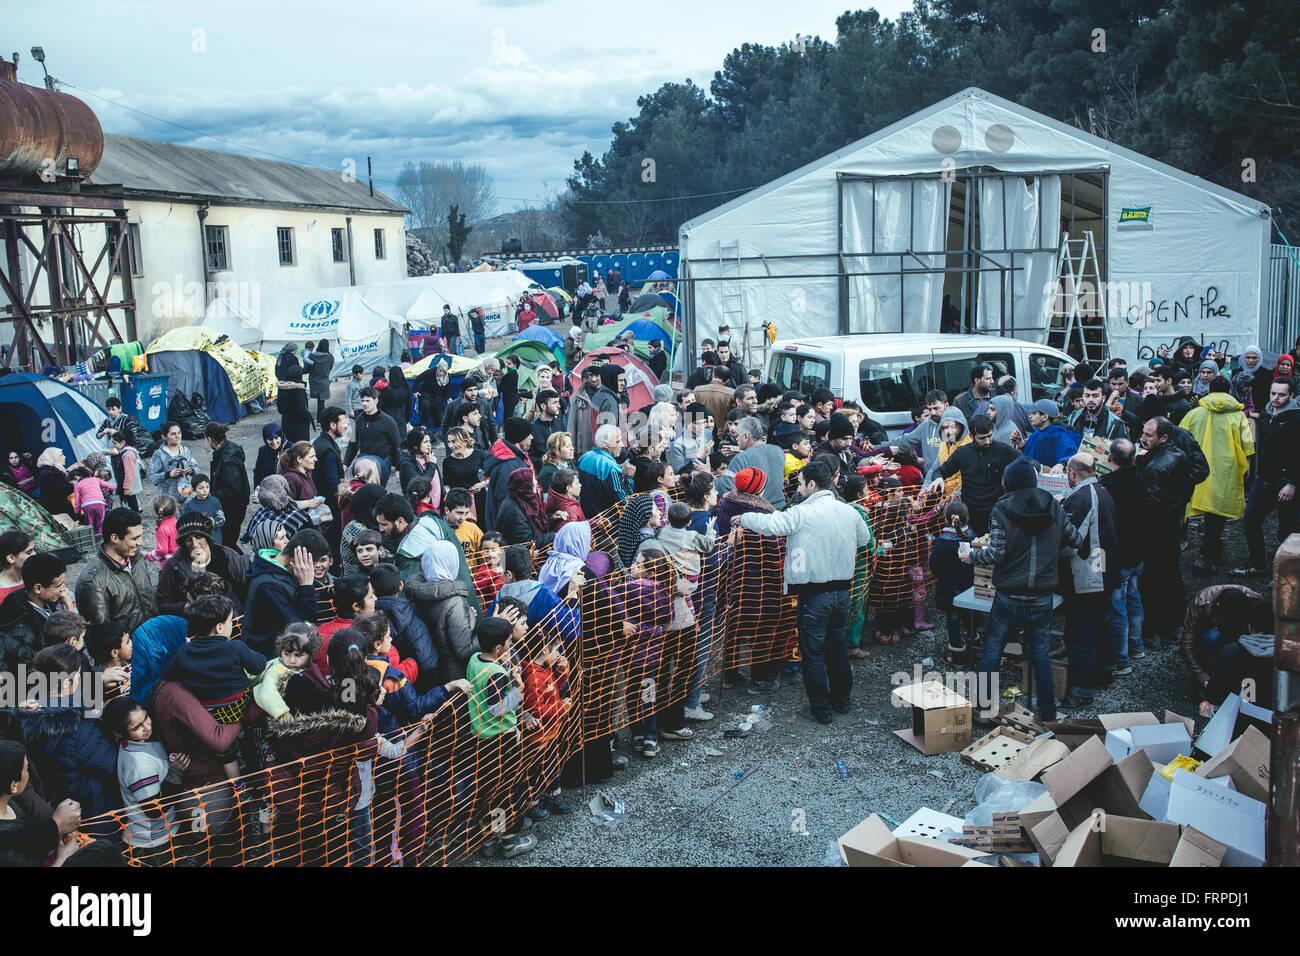 Idomeni refugee camp on the Greece-Macedonia border, refugees queue for food, Idomeni, Central Macedonia, Greece - Stock Image